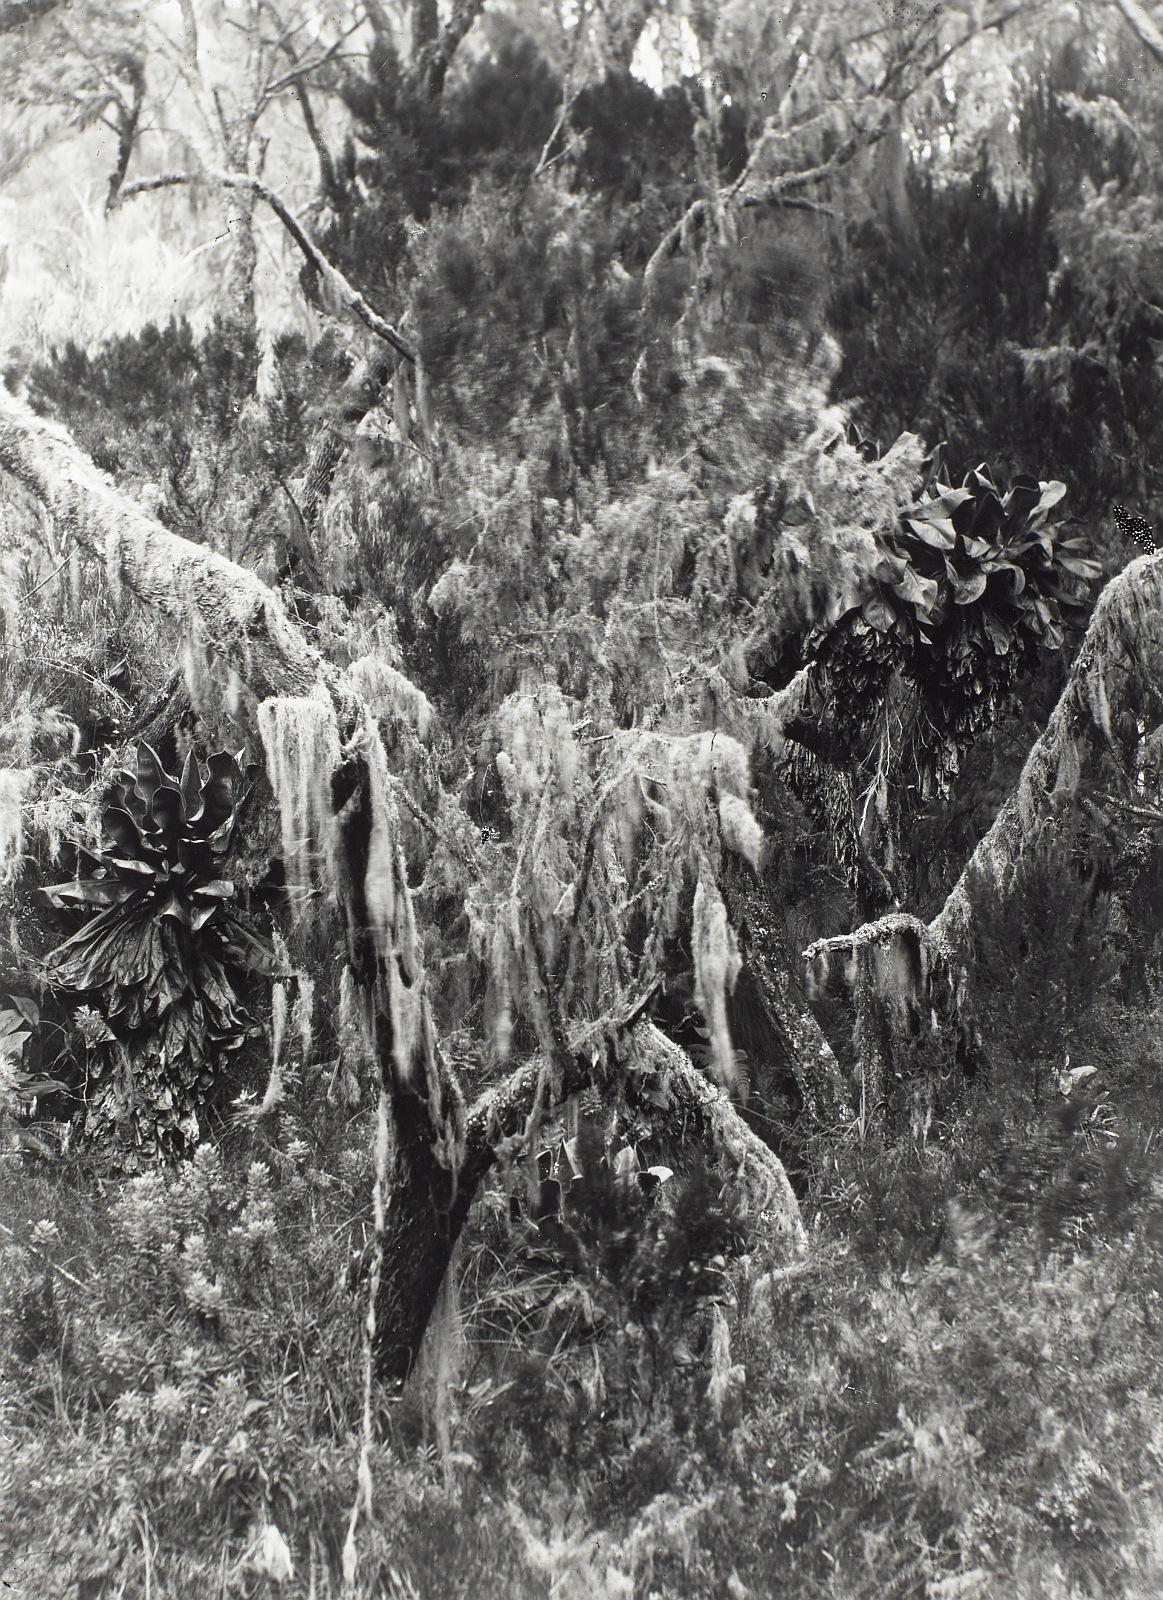 15. Килиманджаро. Горный лес